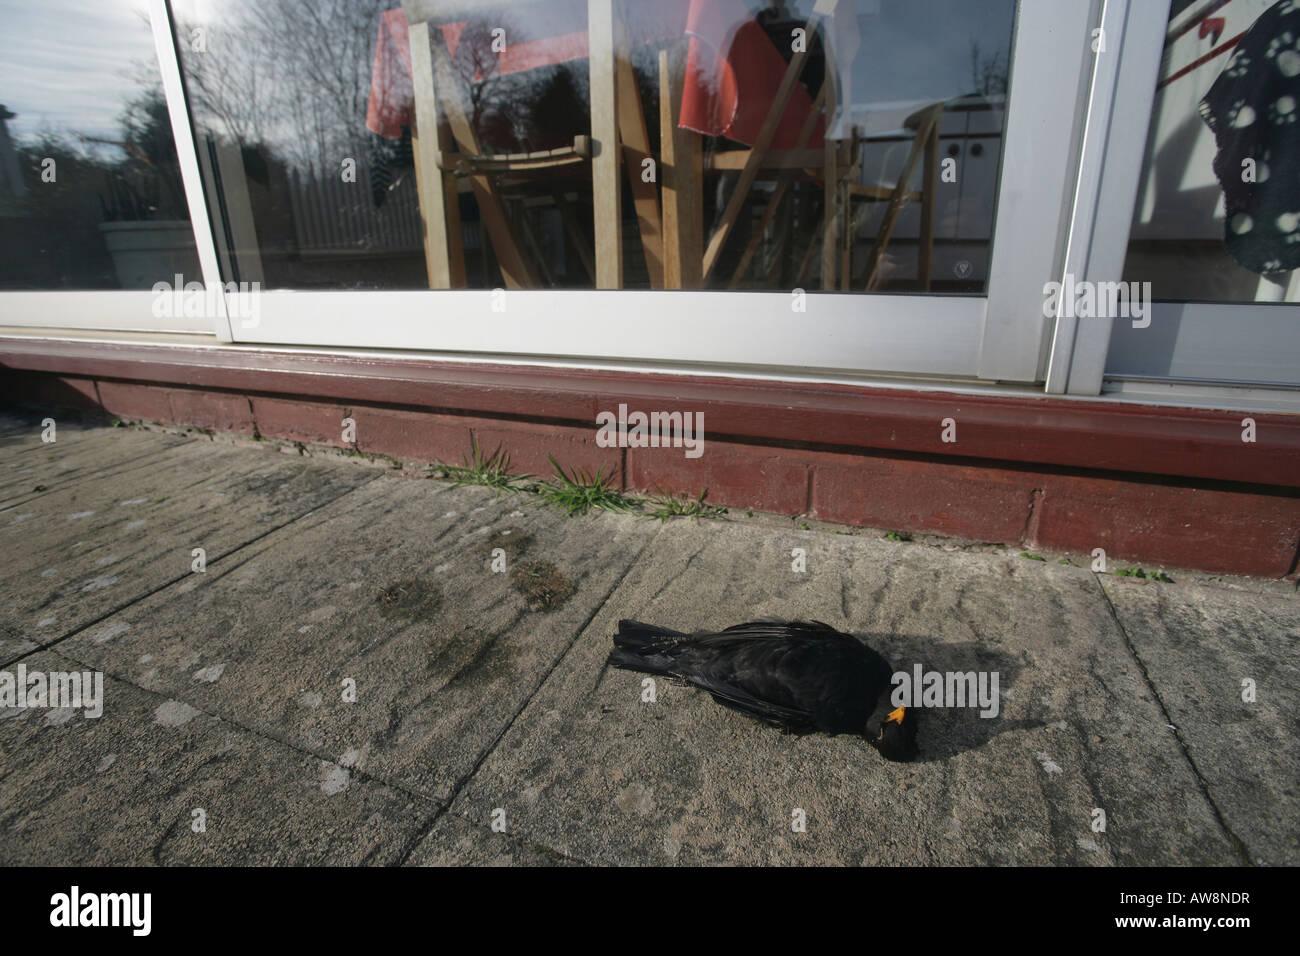 Blackbird Turdus merula Male Killed flying into window West Midlands UK - Stock Image